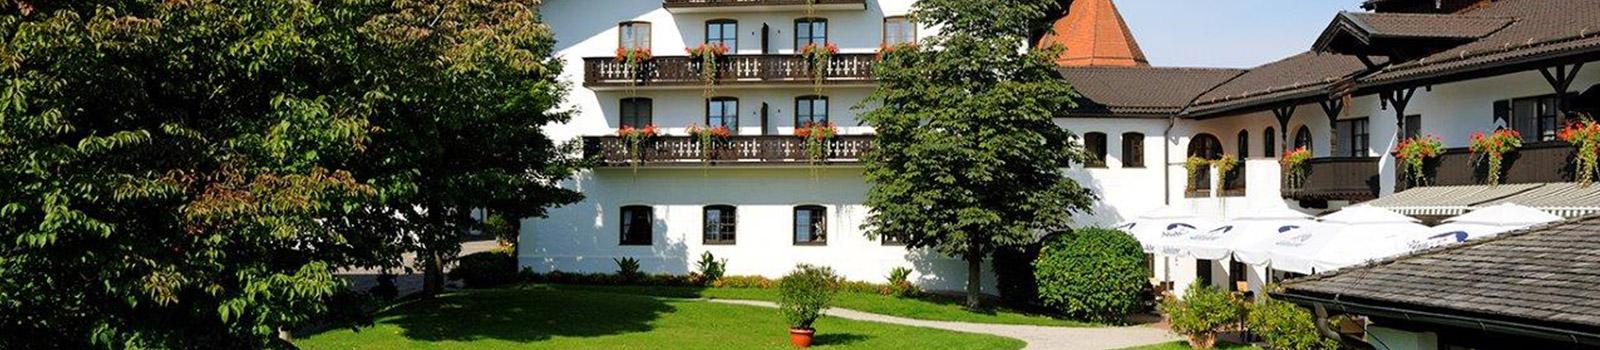 Hotel Gut Ising - 4 Sterne Superior